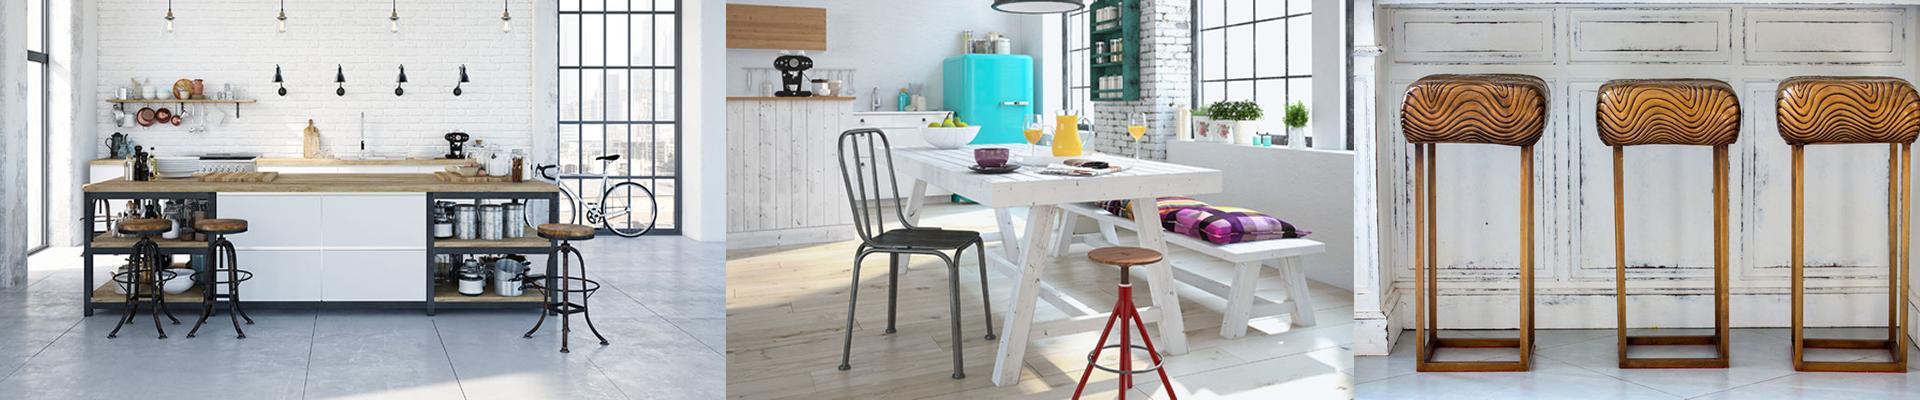 Breakfast Bar Stools, Kitchen Stools & Bar Chairs